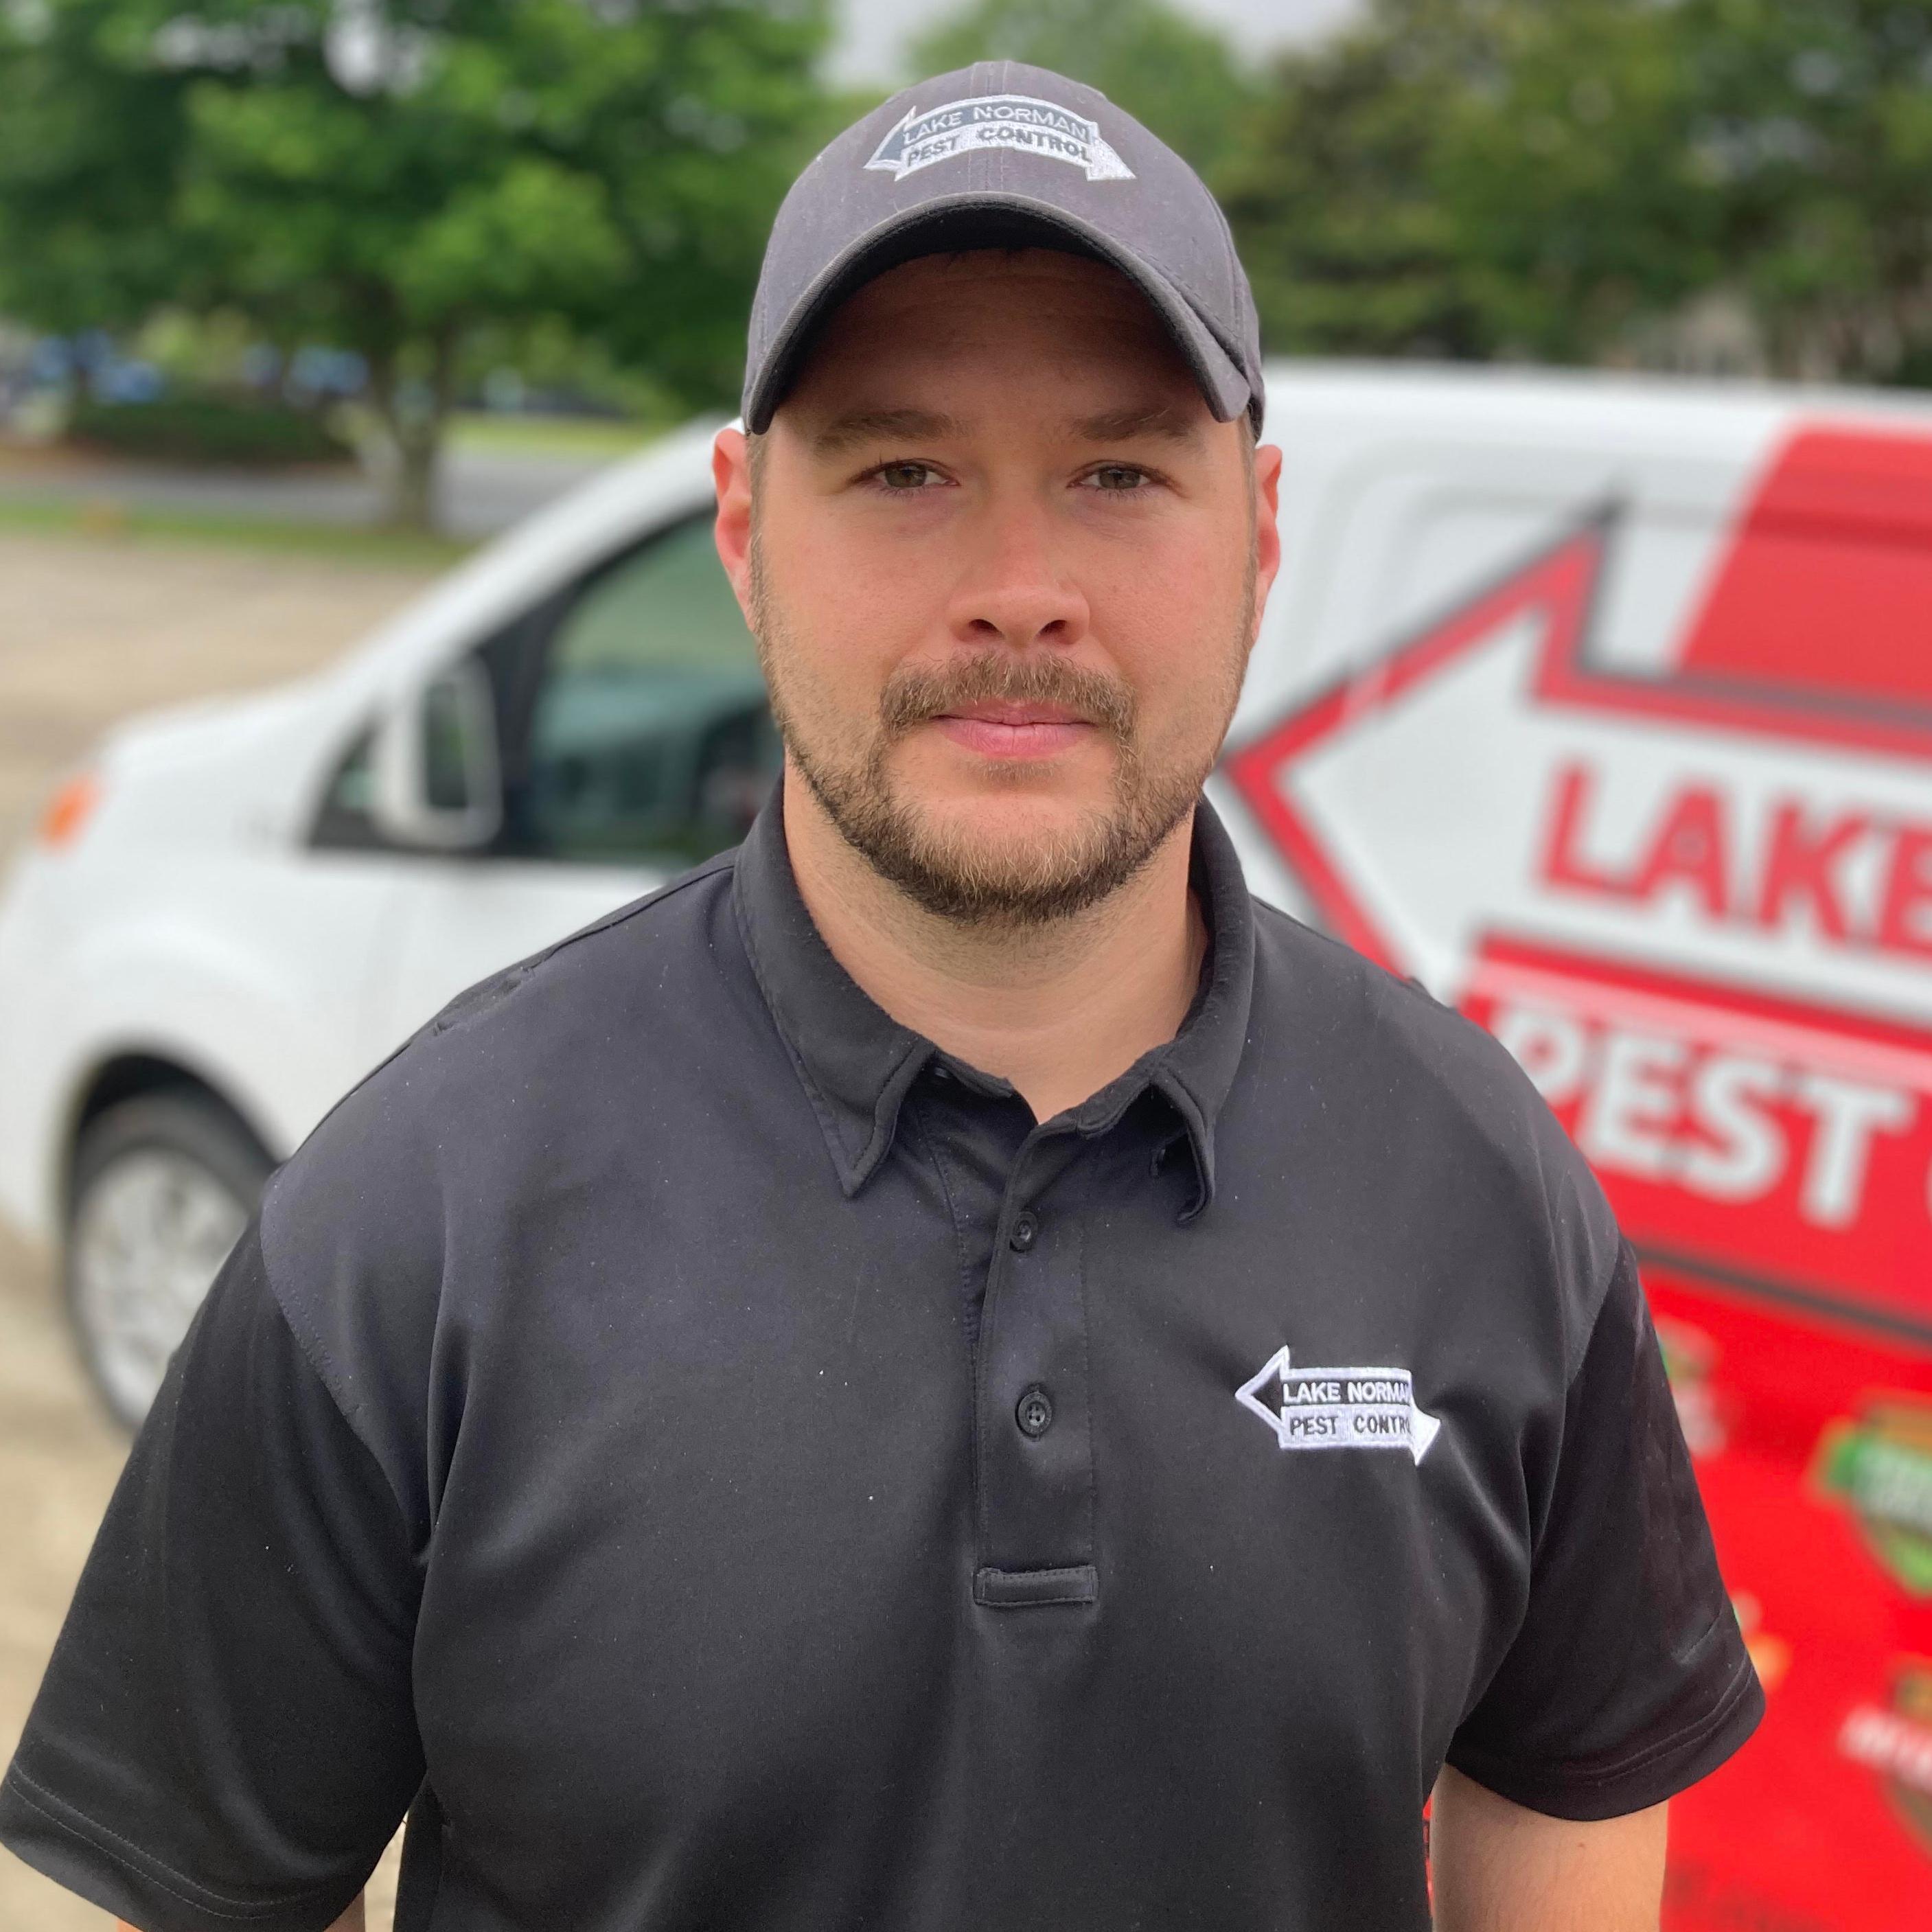 a lake norman pest control employee